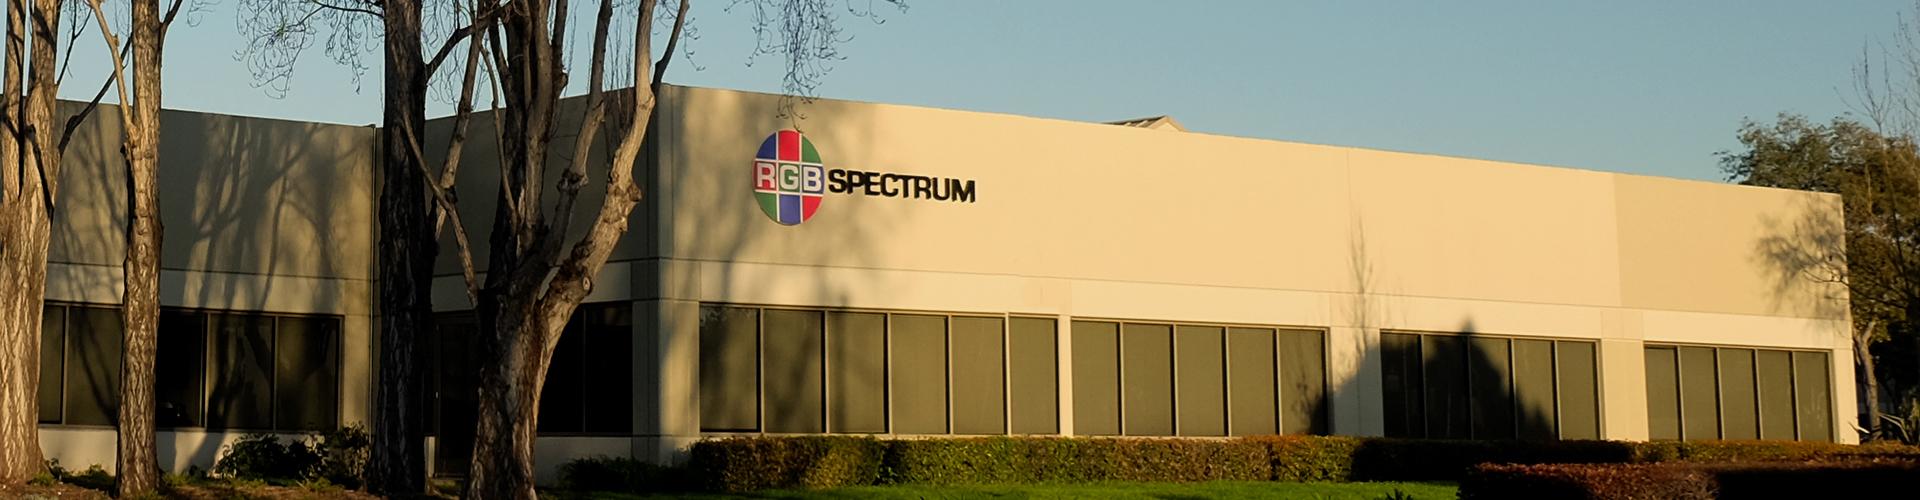 RGB Spectrum 1101 Marina Village Pkwy Suite 101, Alameda